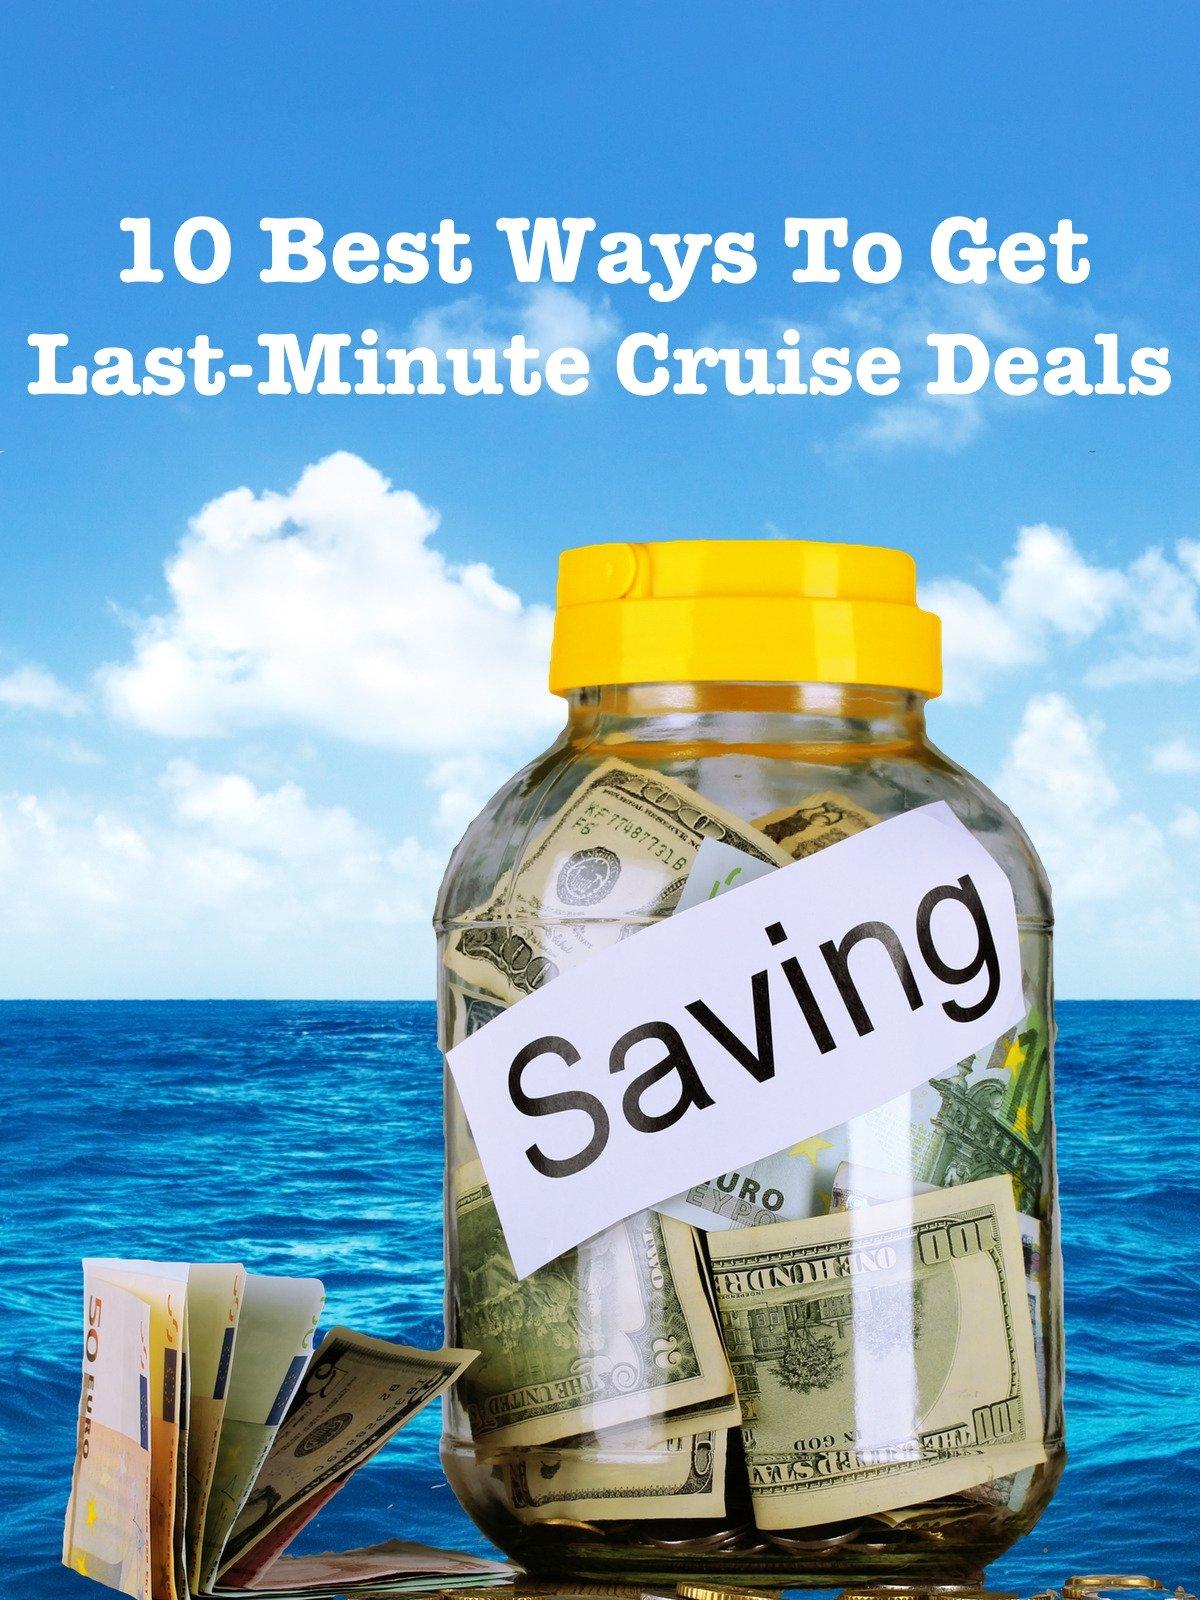 Amazon Com Watch 10 Best Ways To Get Last Minute Cruise Deals Prime Video